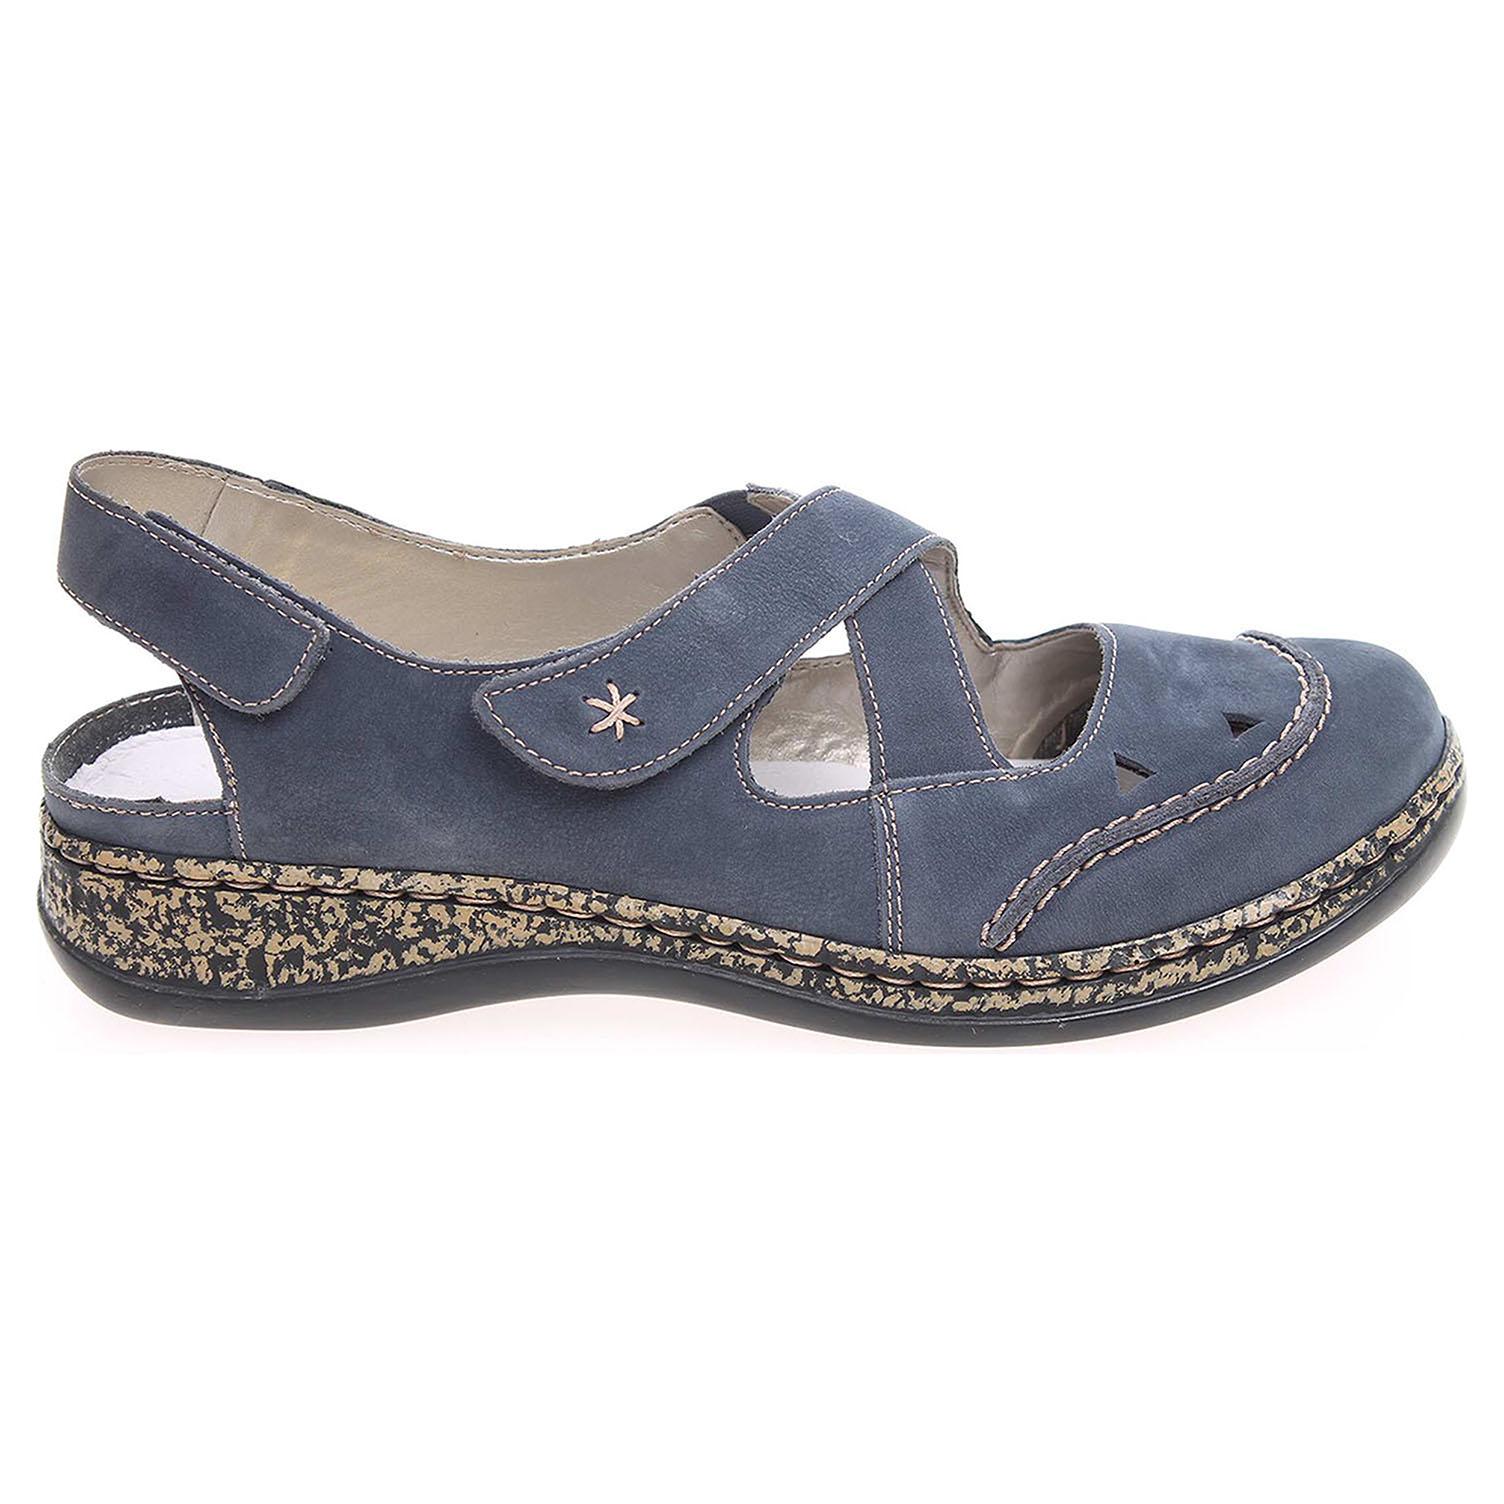 Rieker sandály dámské 46379-14 modré 37